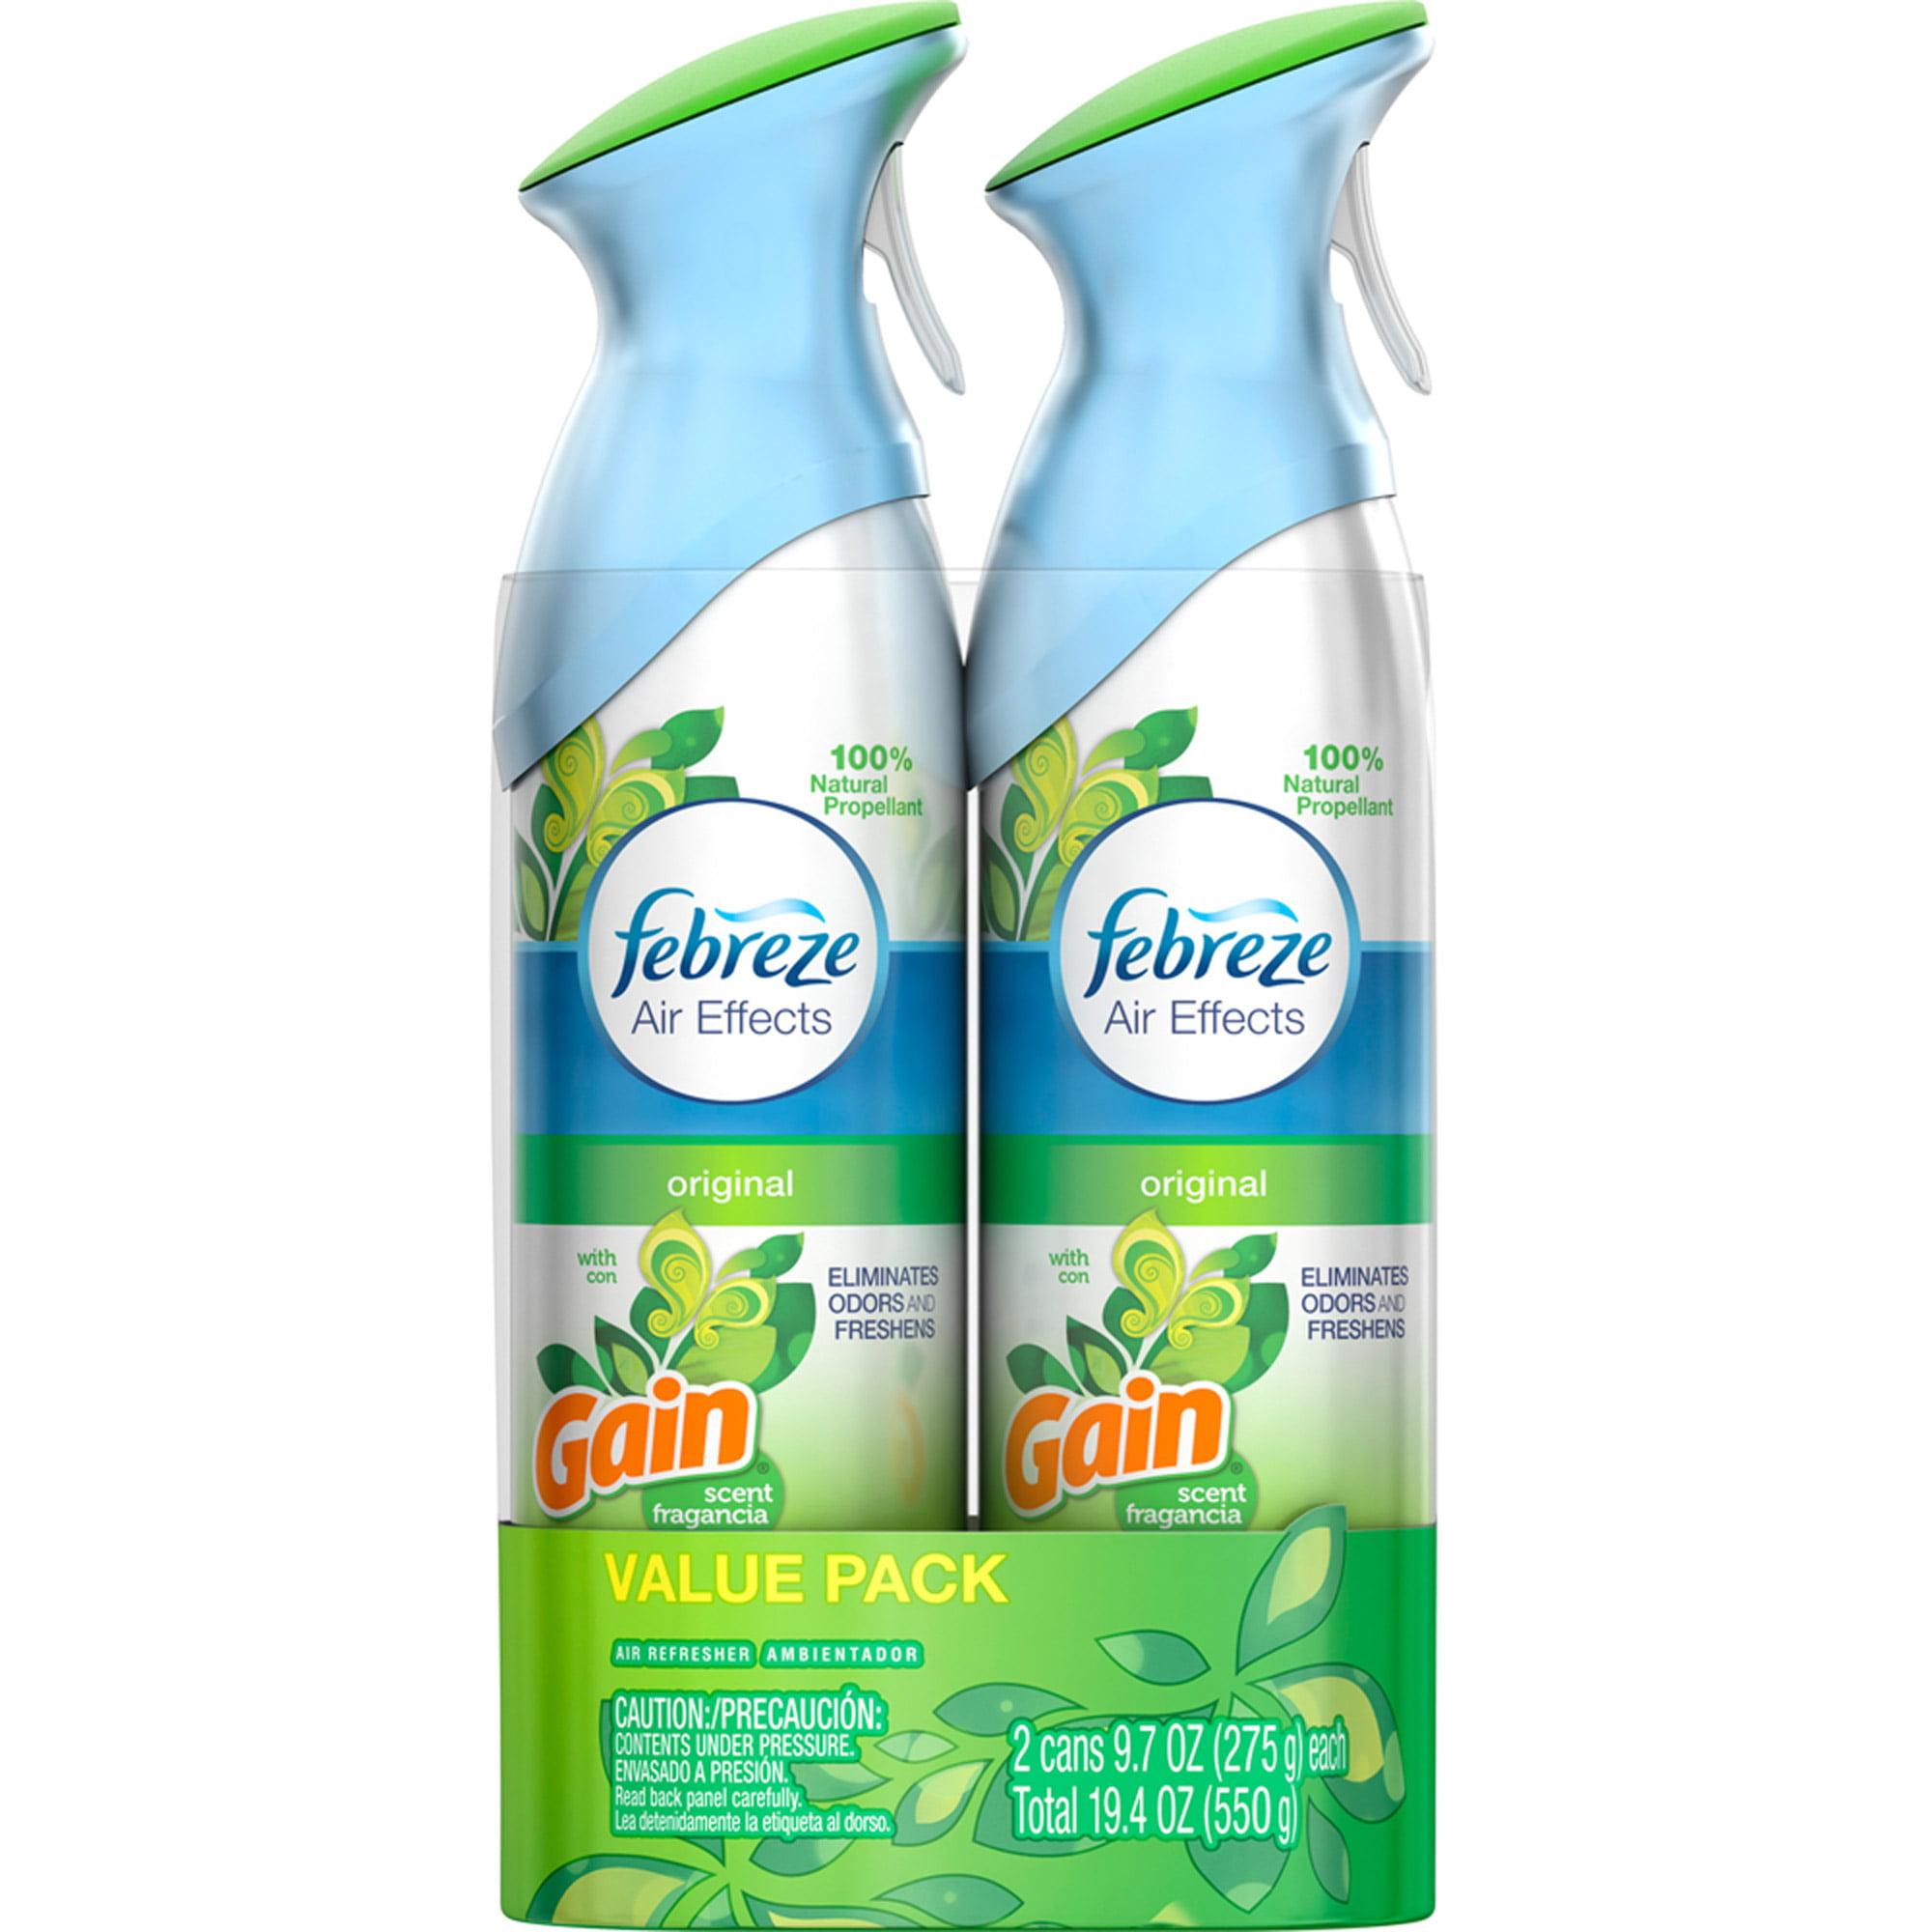 Febreze Air Effects Gain Original Air Freshener, 9.7 oz, 2 count